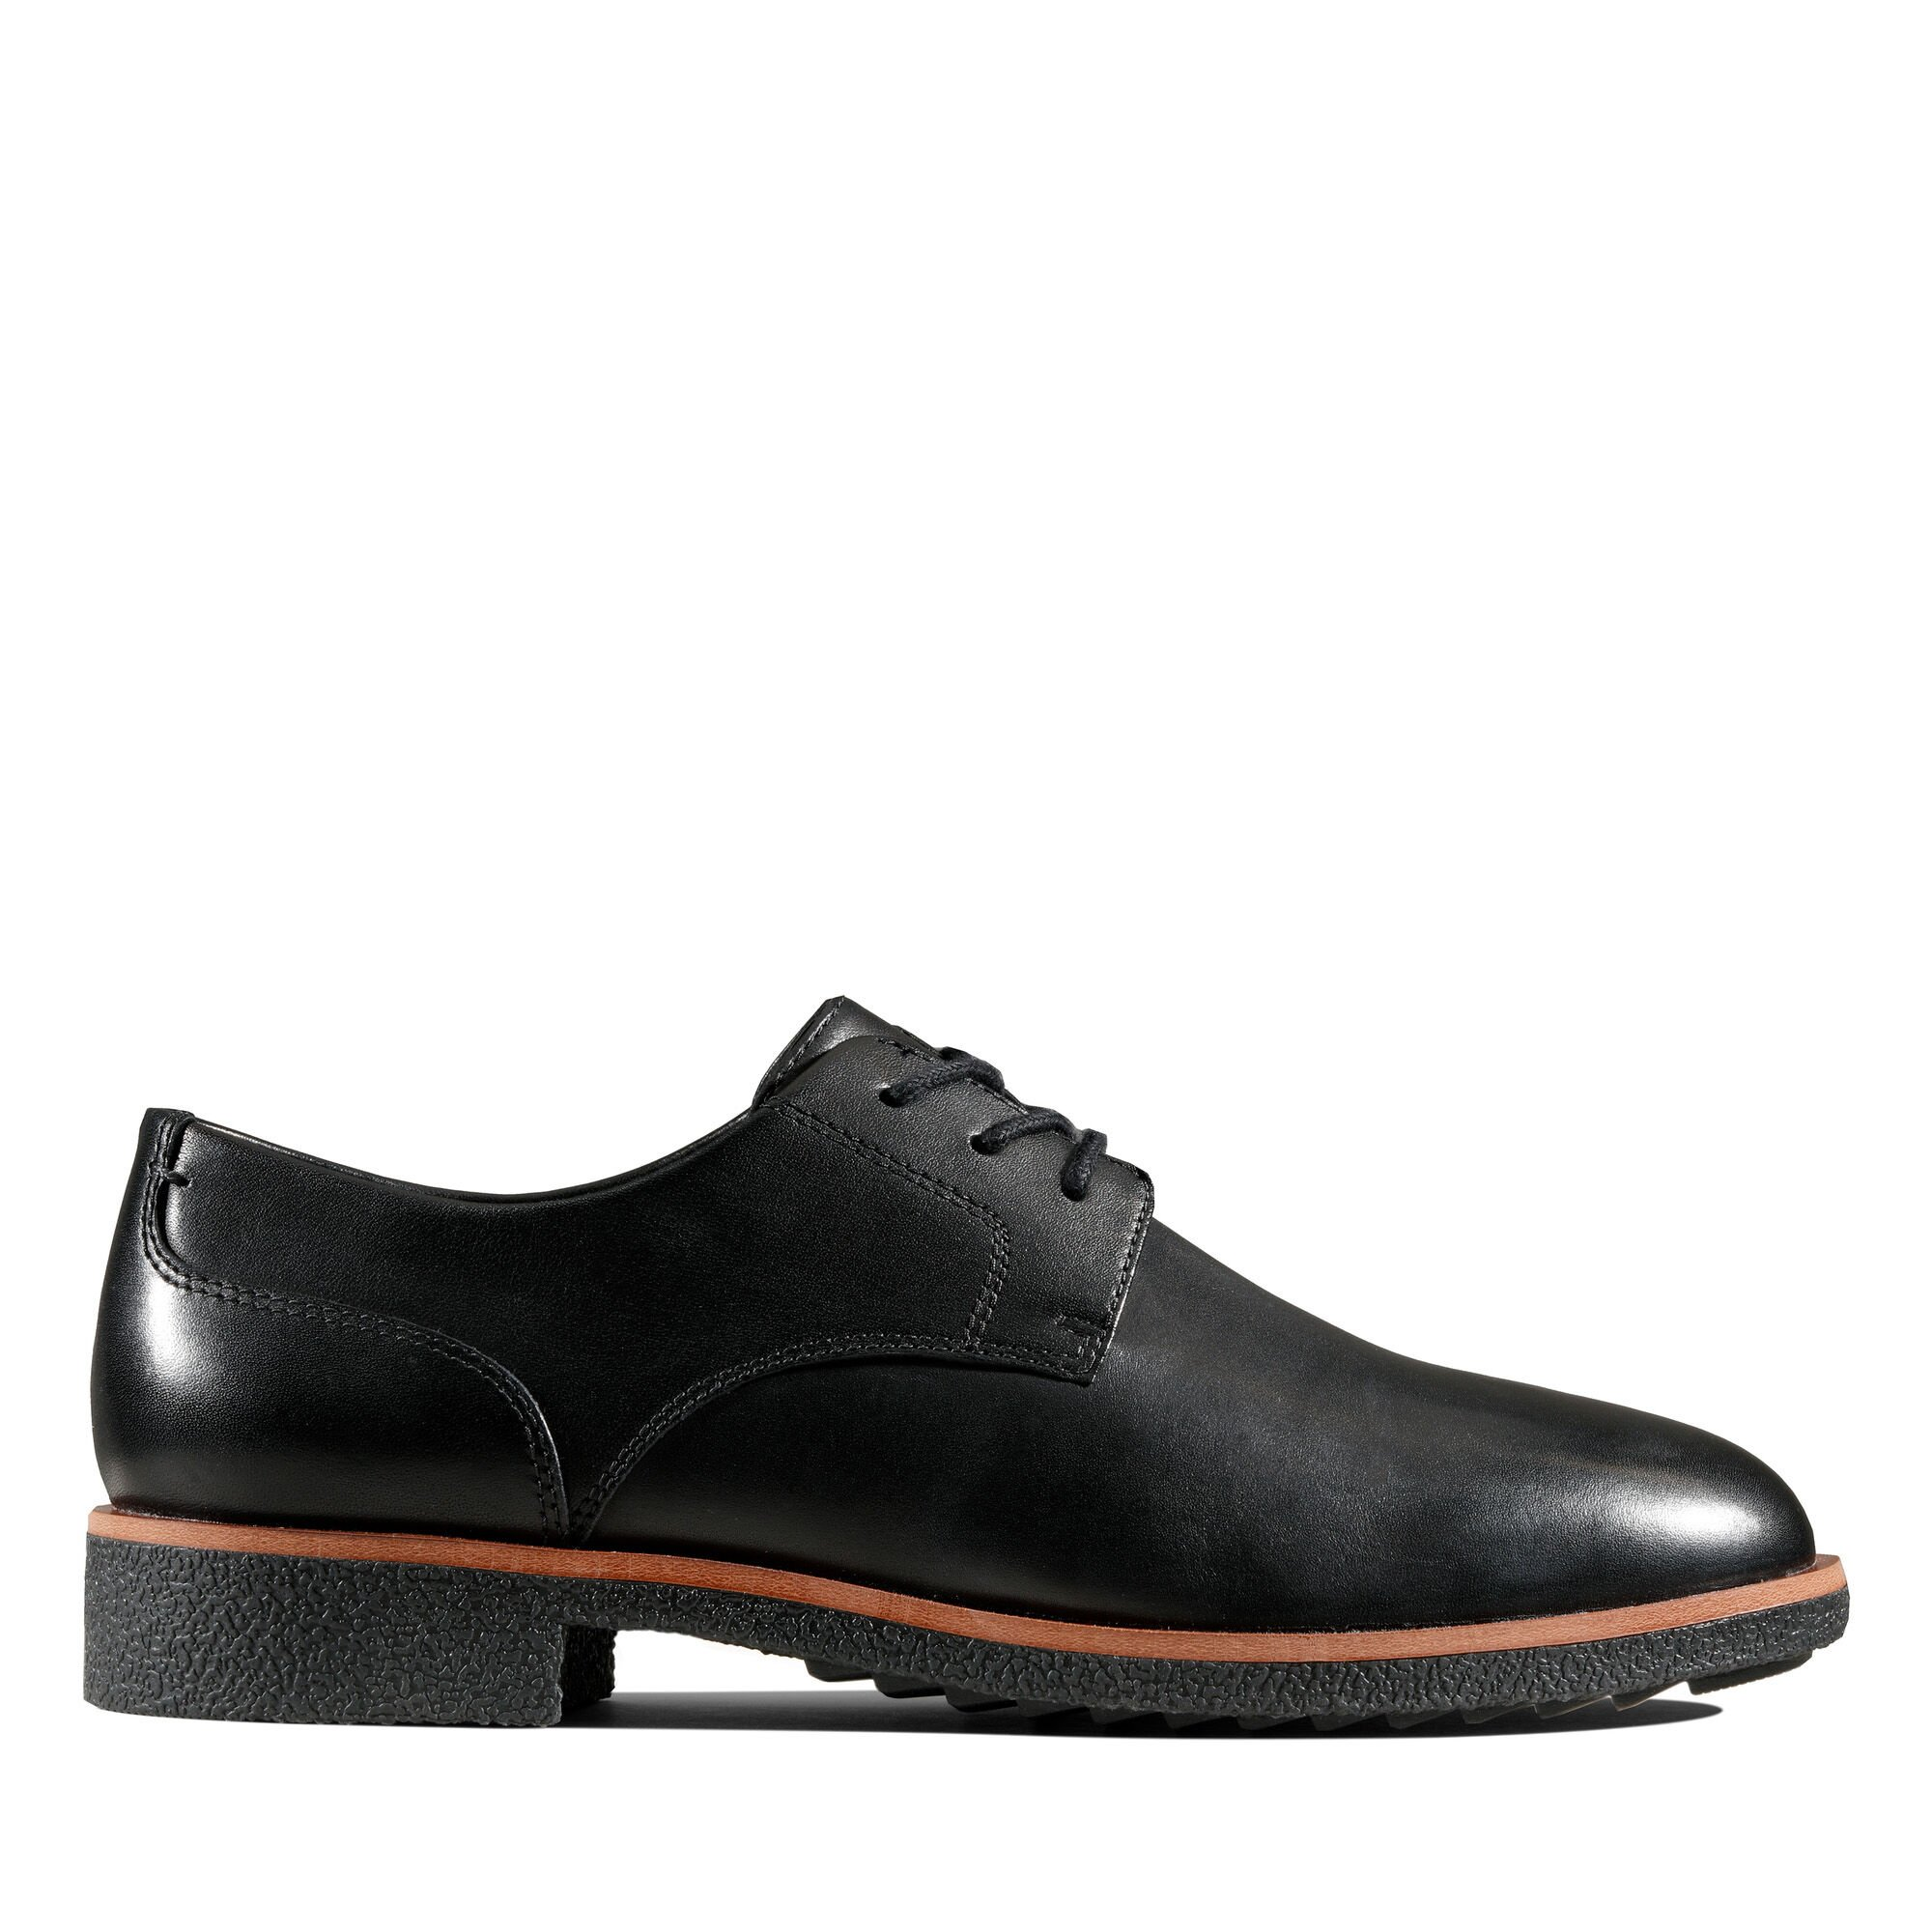 Women's Brogues Shoes | Clarks